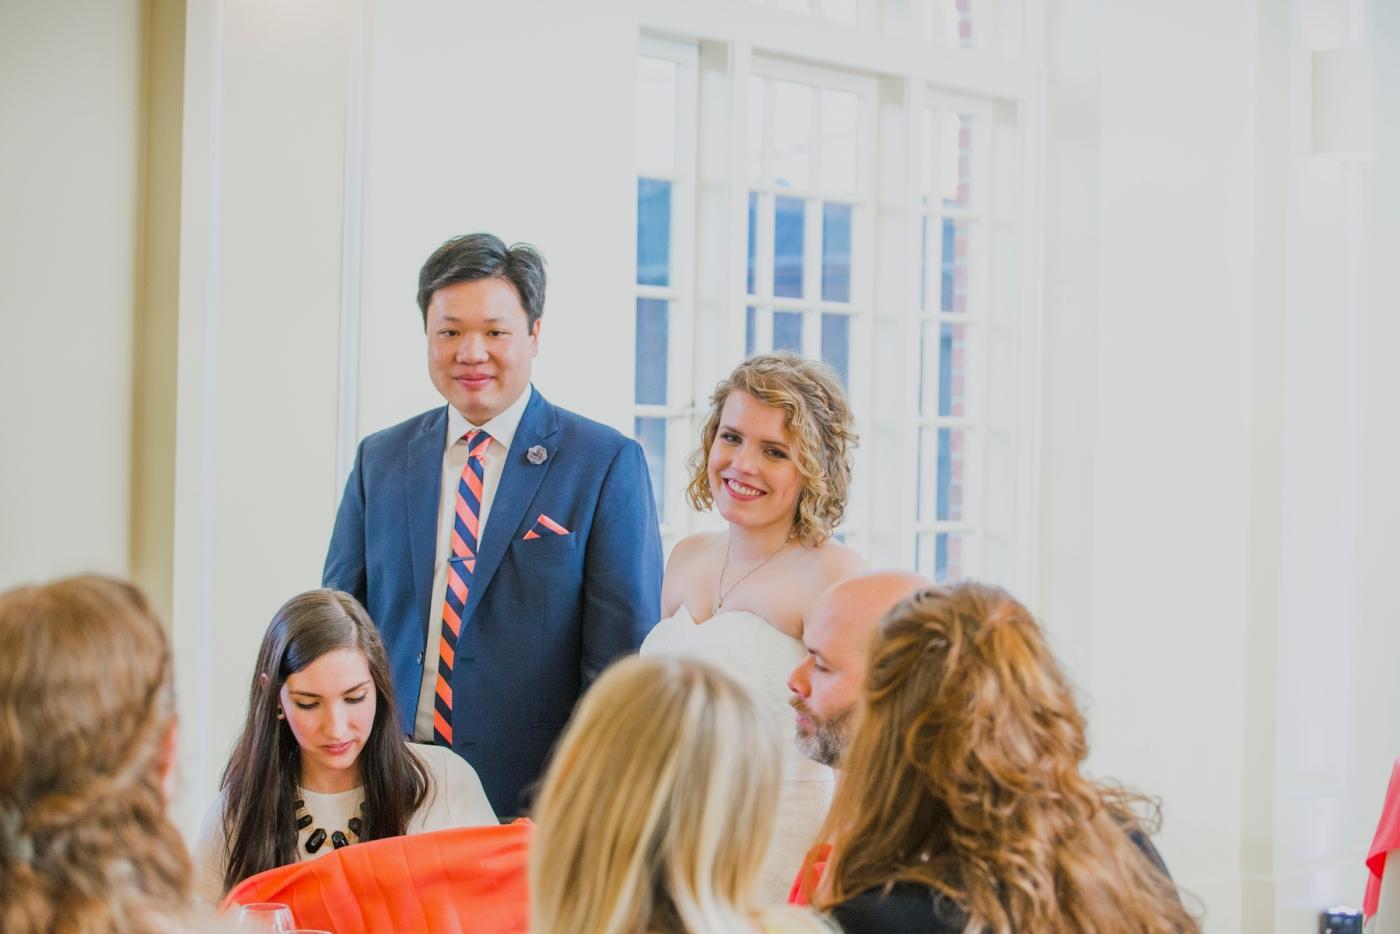 DSC_3190Everett_Wedding_Ballroom_Jane_Speleers_photography_Rachel_and_Edmund_reception_2017